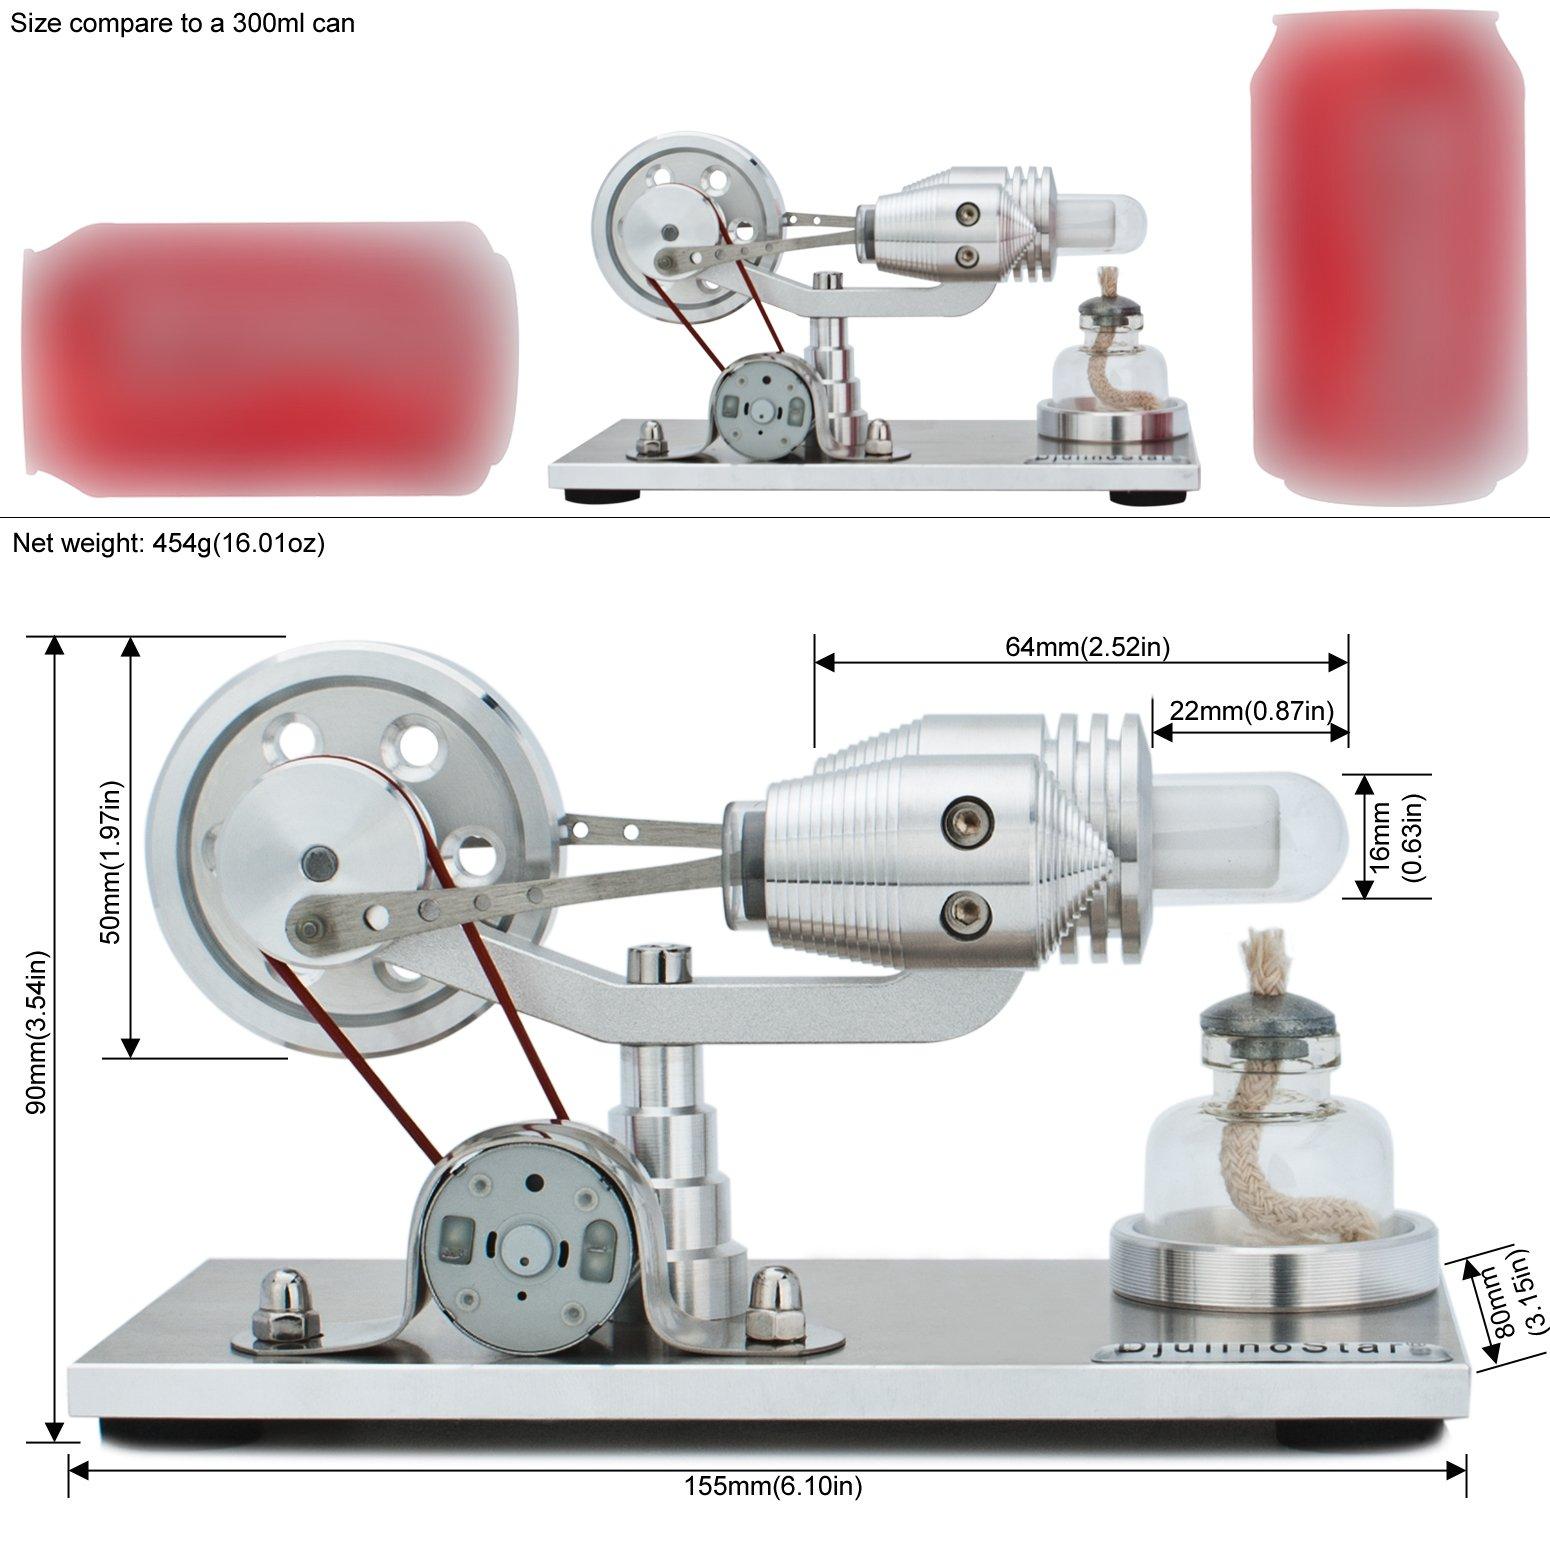 DjuiinoStar Hot Air Stirling Engine, Solid Metal Construction, Electricity Generator(Assembled), My First Stirling Engine by DjuiinoStar (Image #2)